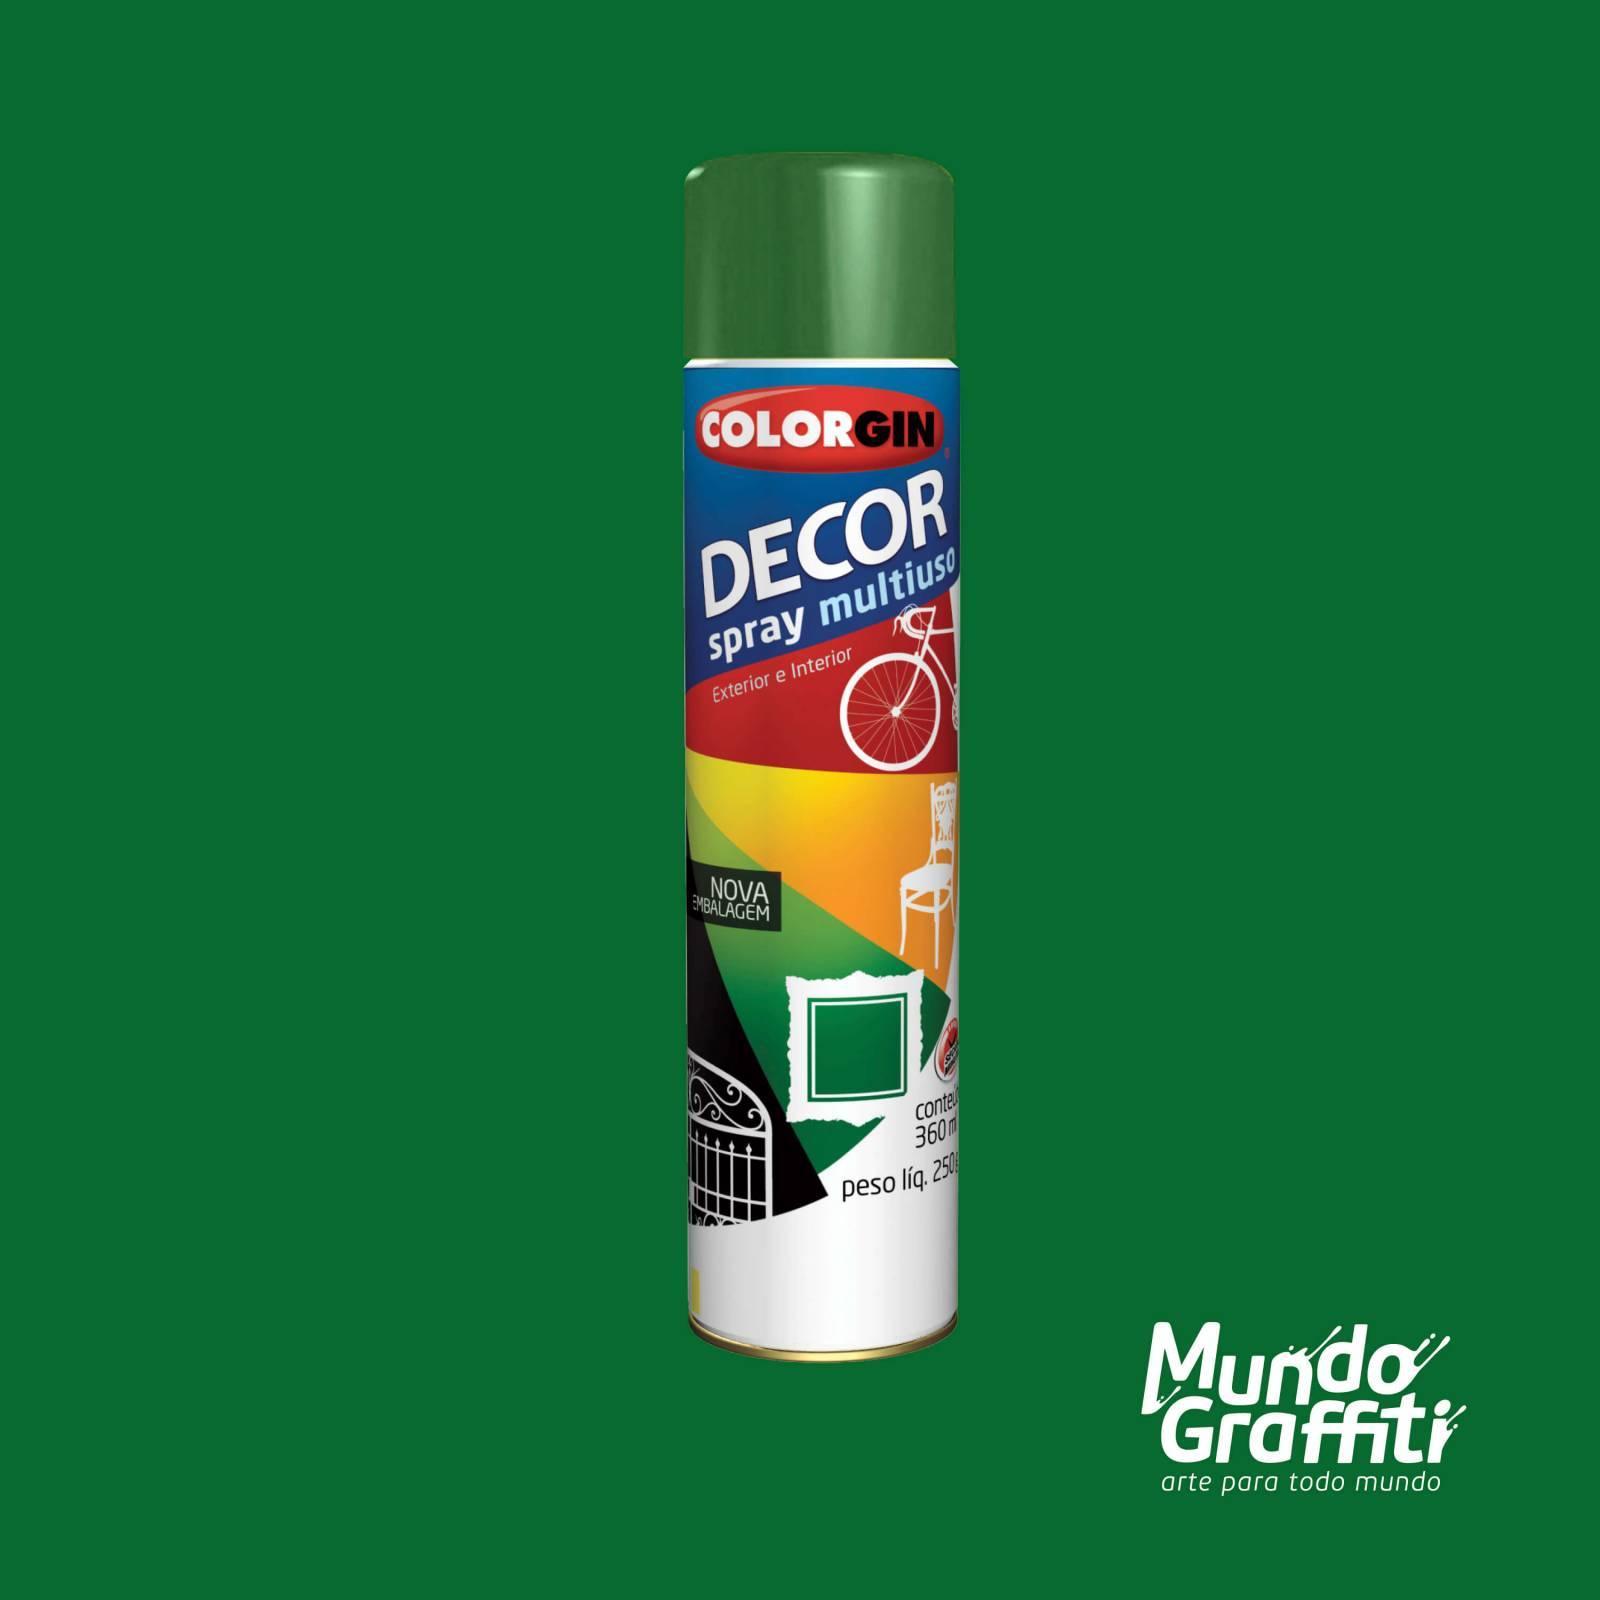 Tinta Spray Colorgin Decor 8751 Verde Folha Brilhante 360ml - Mundo Graffiti